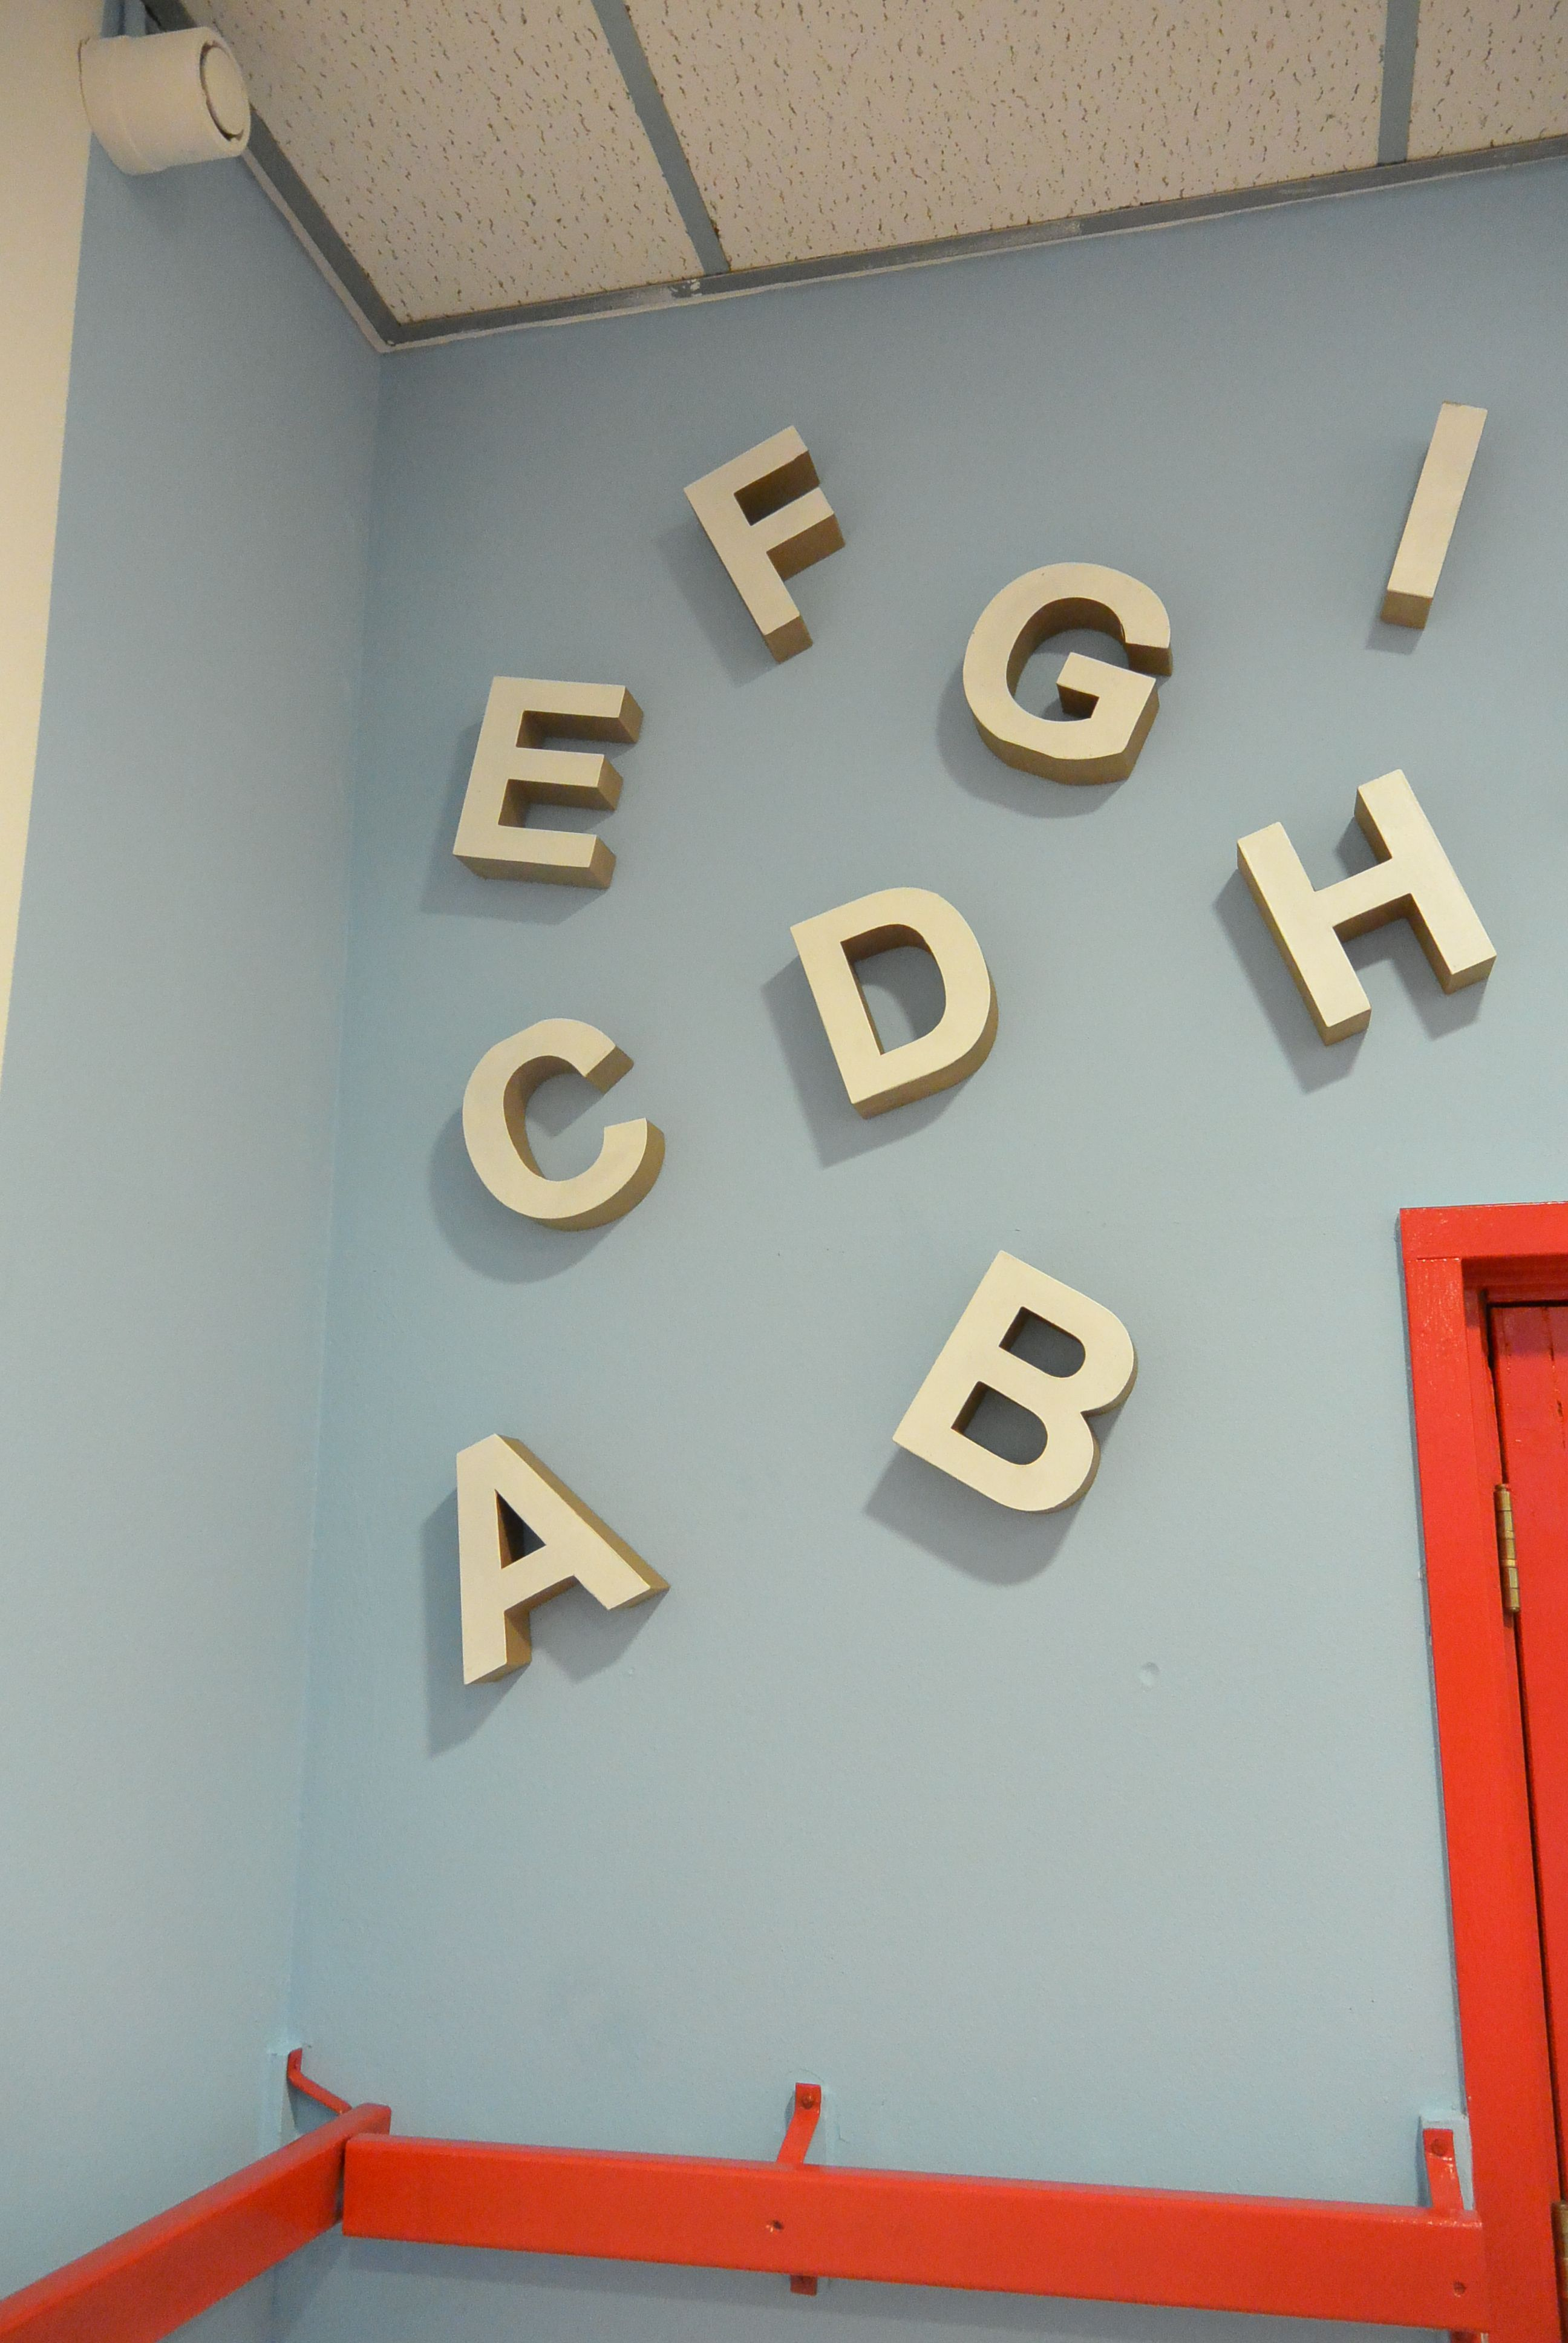 Kartonnen abc van kartonnen letters #Xenos | Eigen project Bax ...